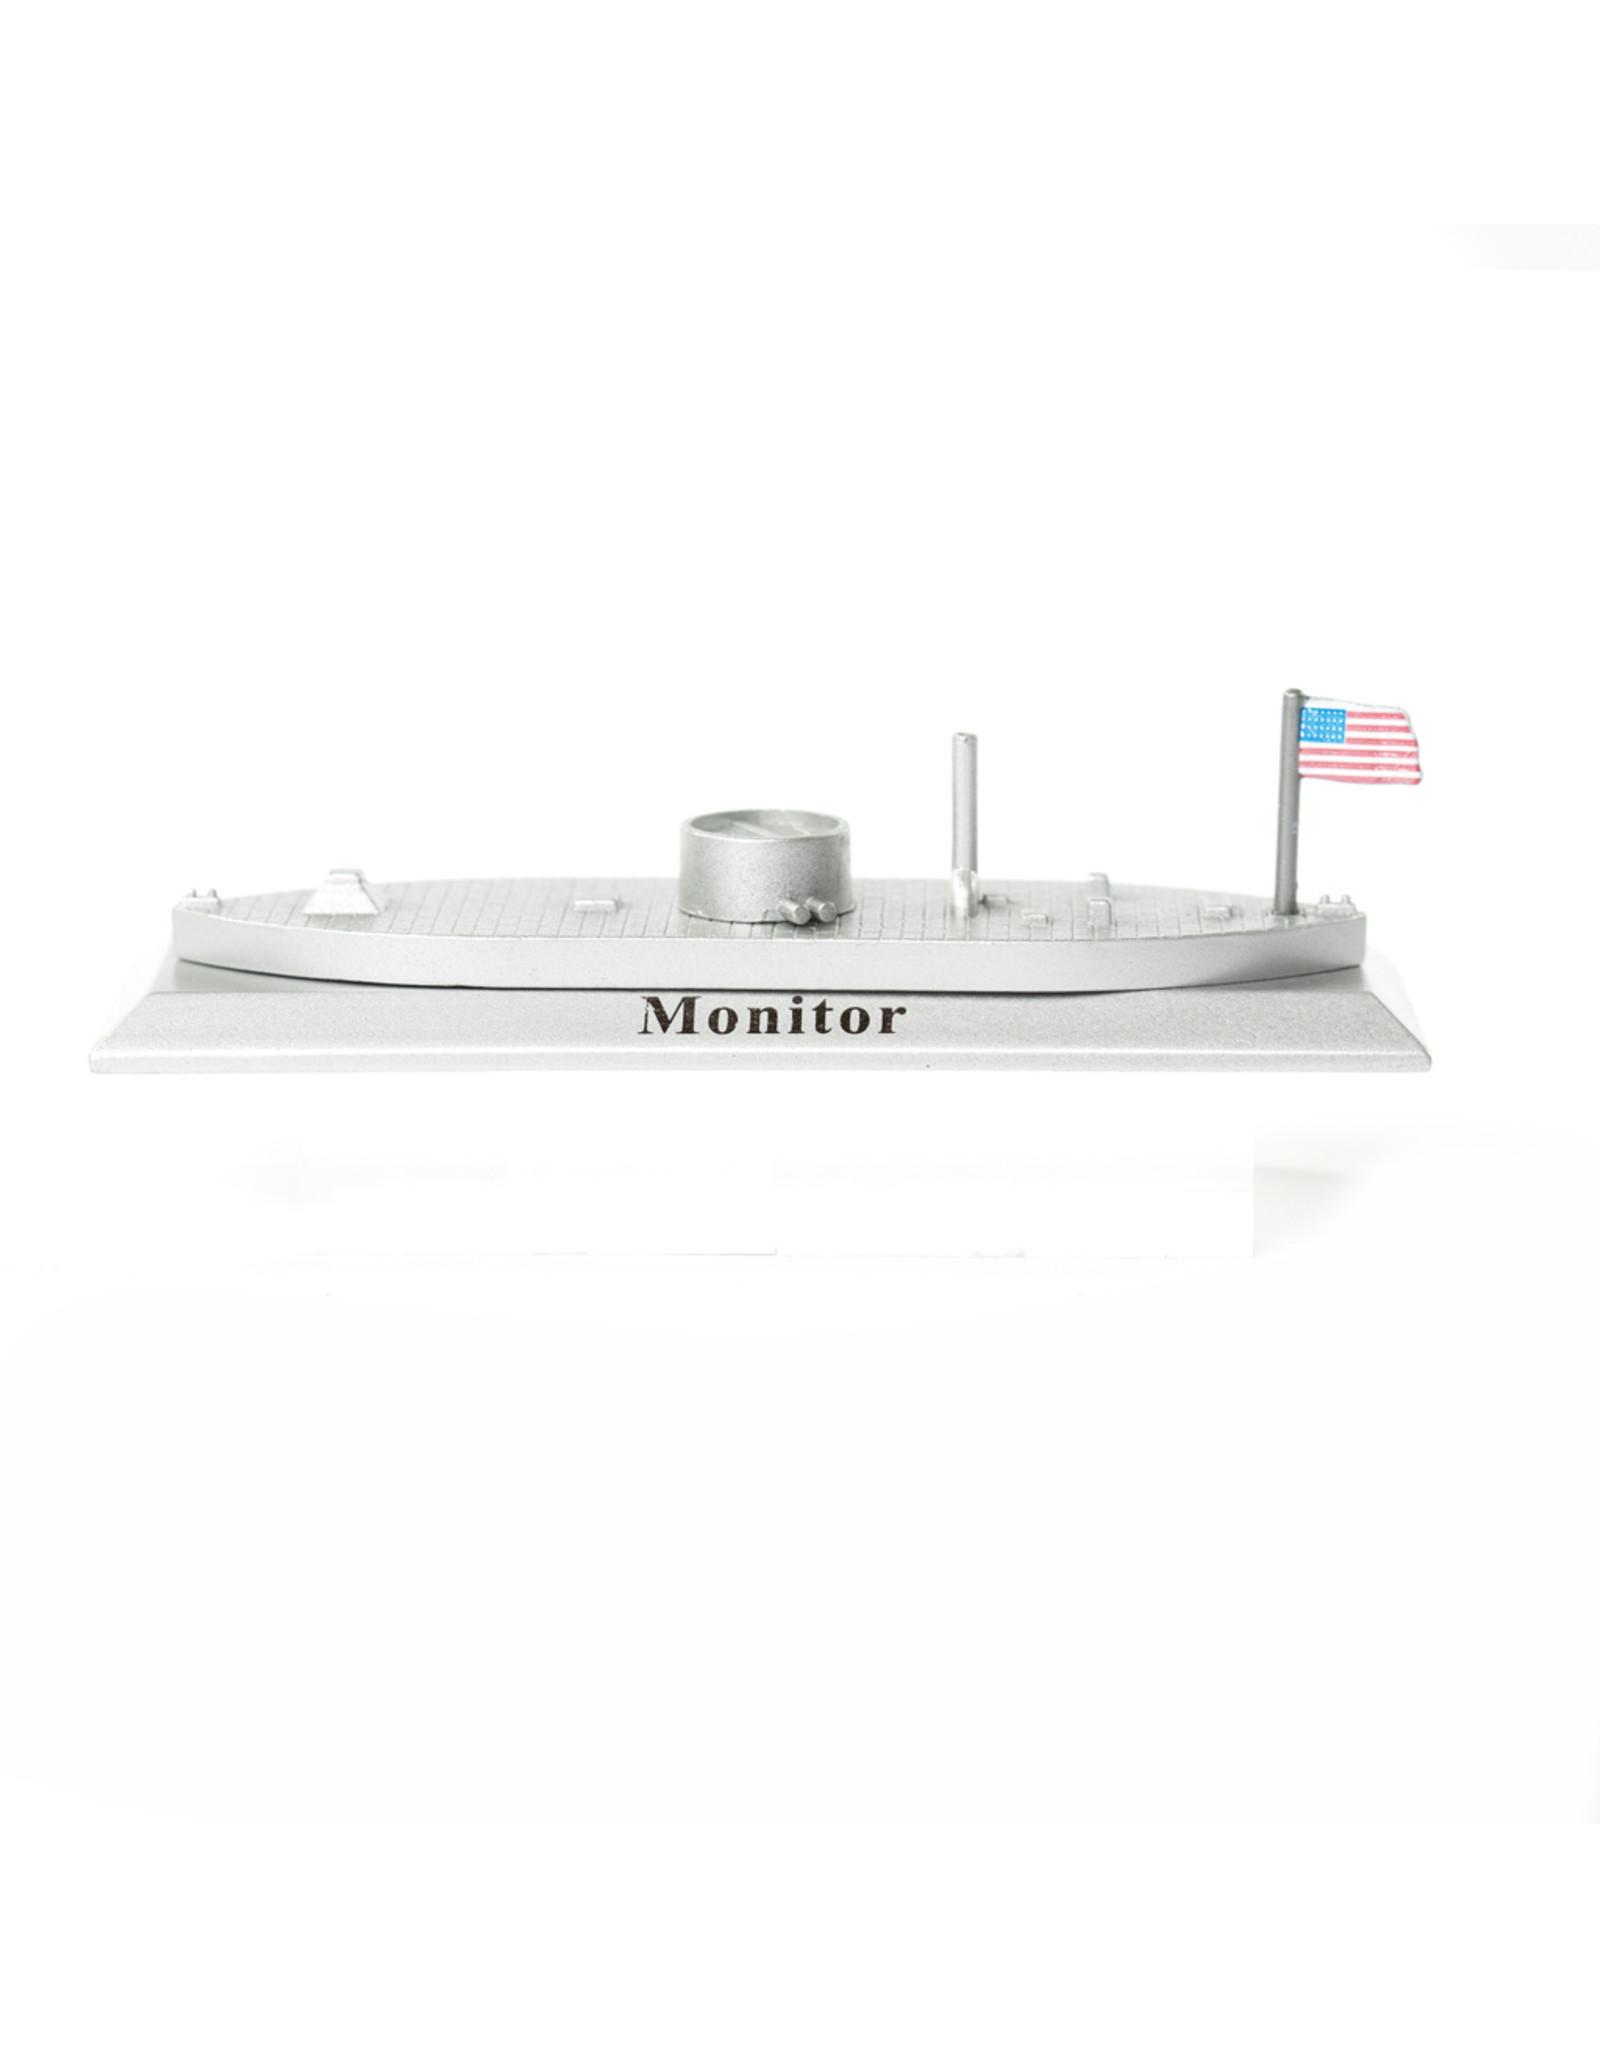 Monitor Metal Figurine